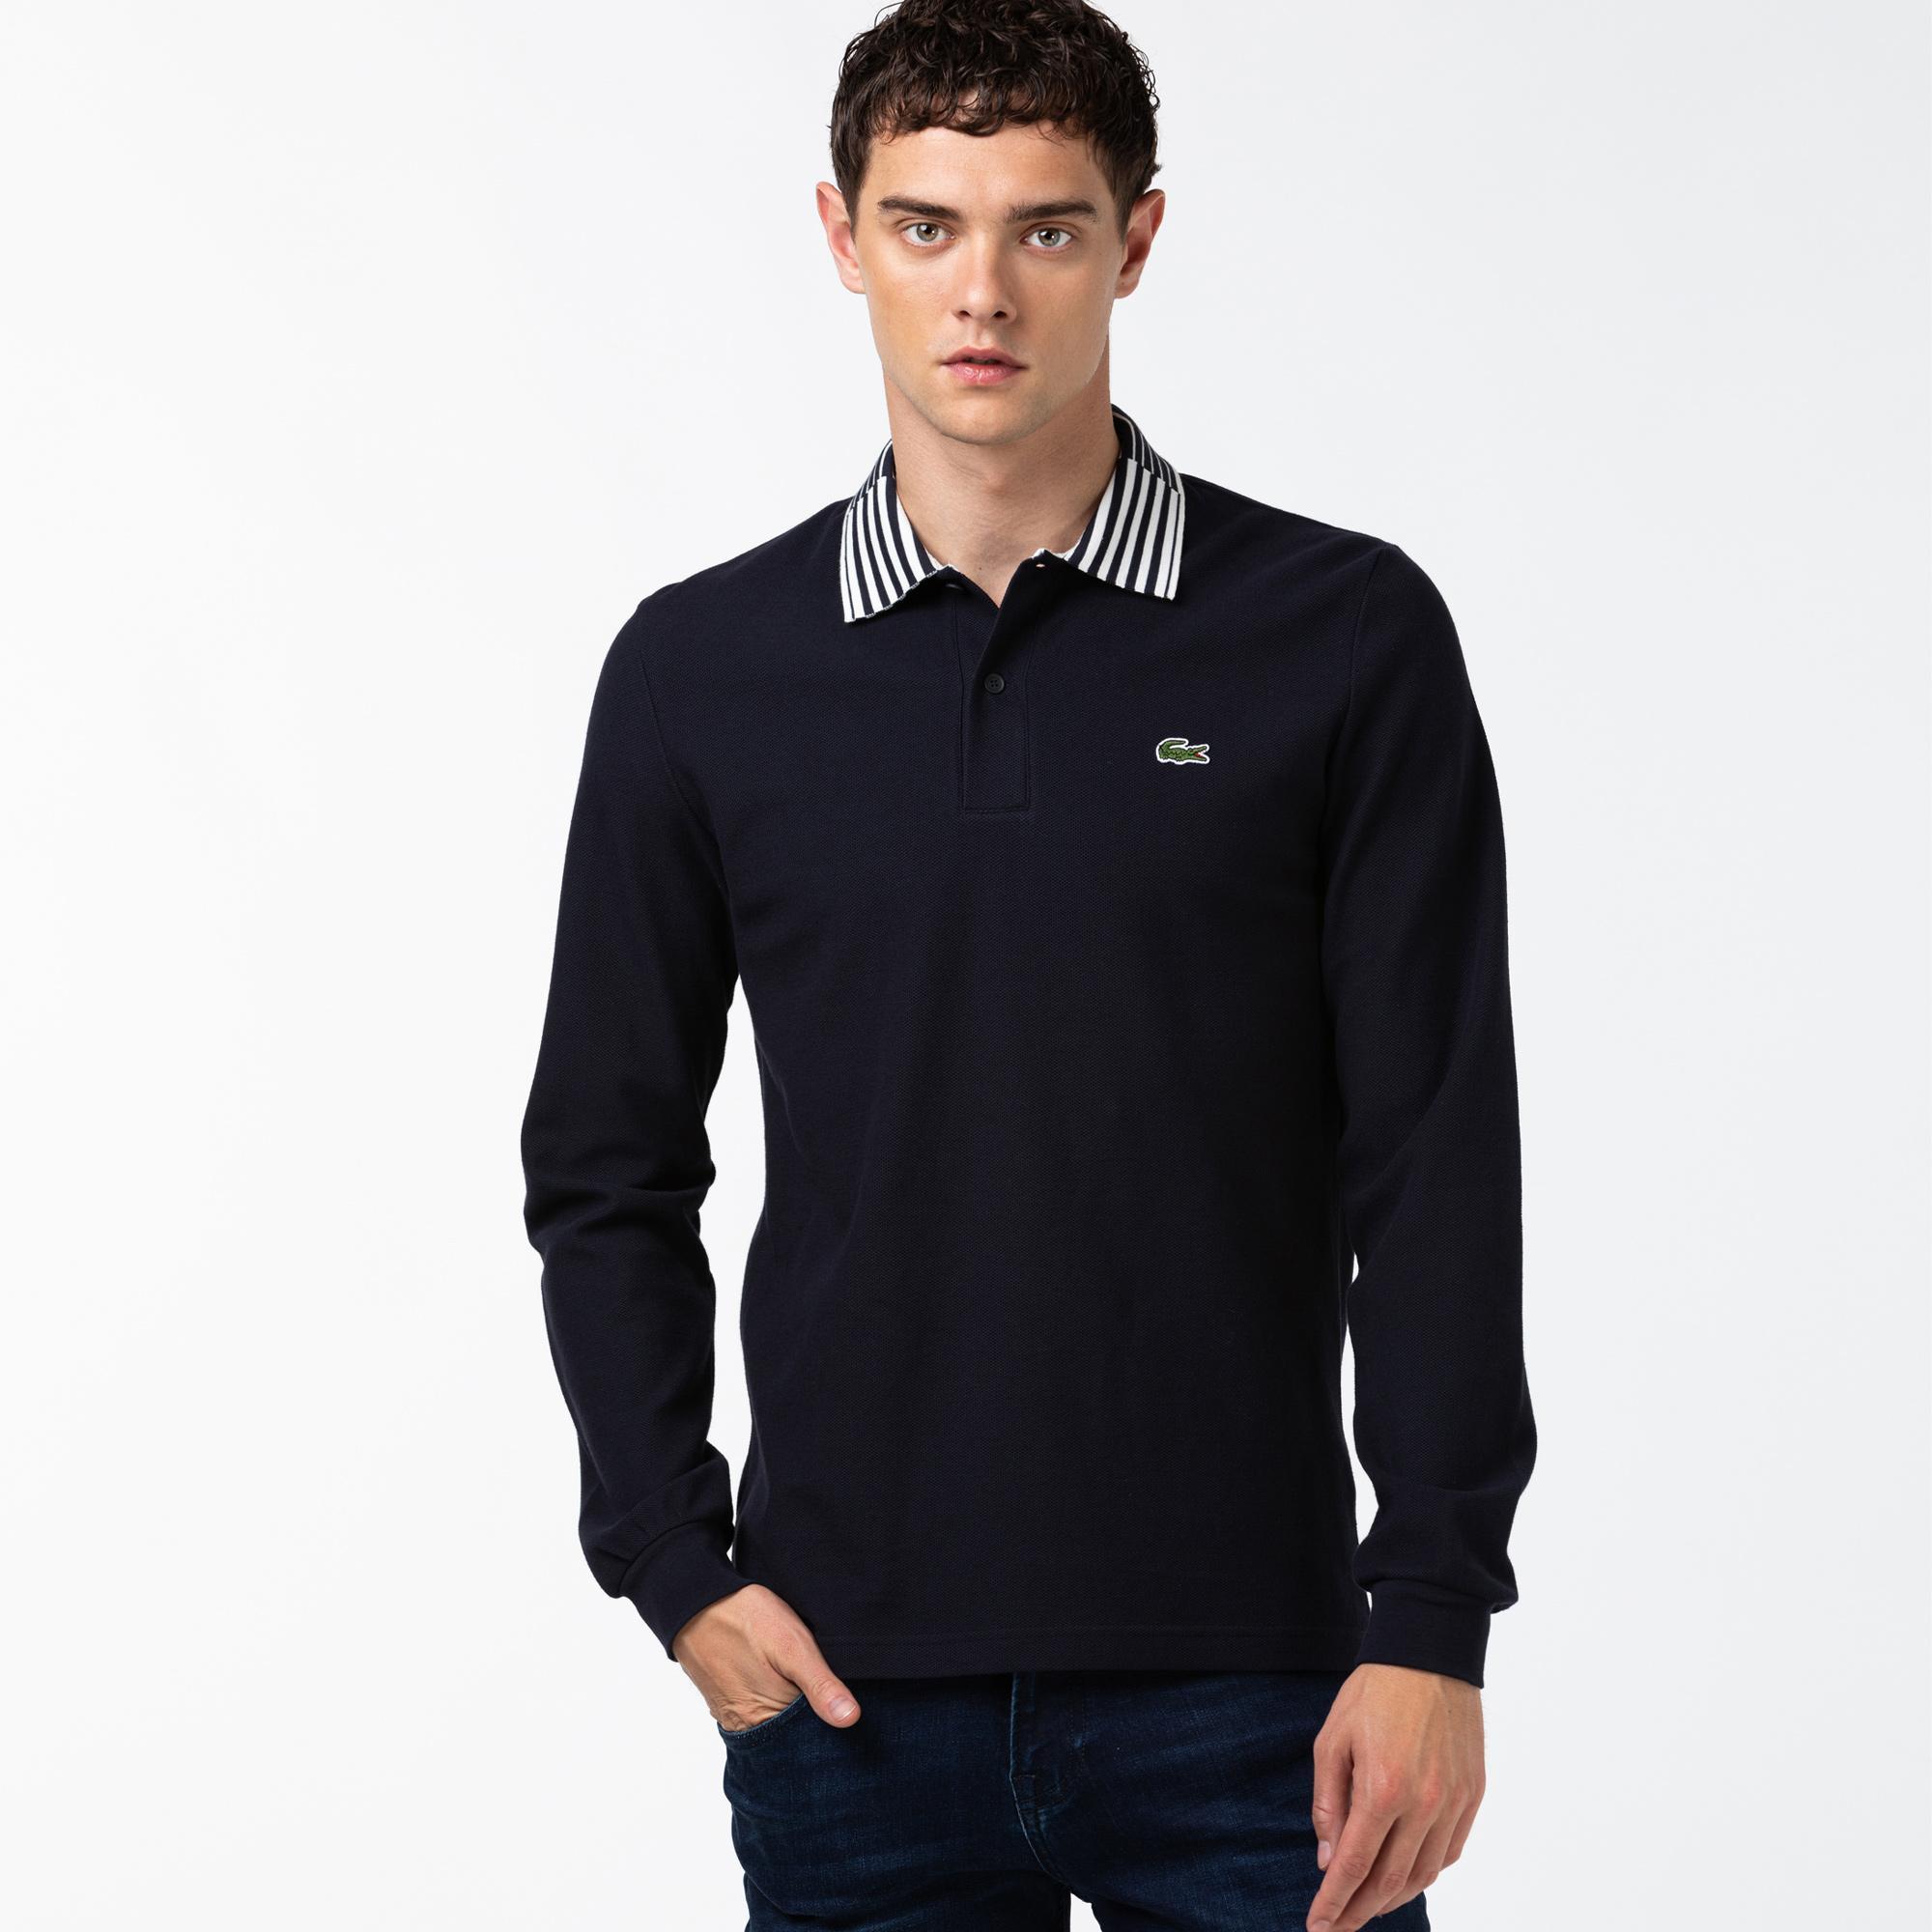 Lacoste Heritage Męska Bawełniana Koszulka Polo Slim Fit